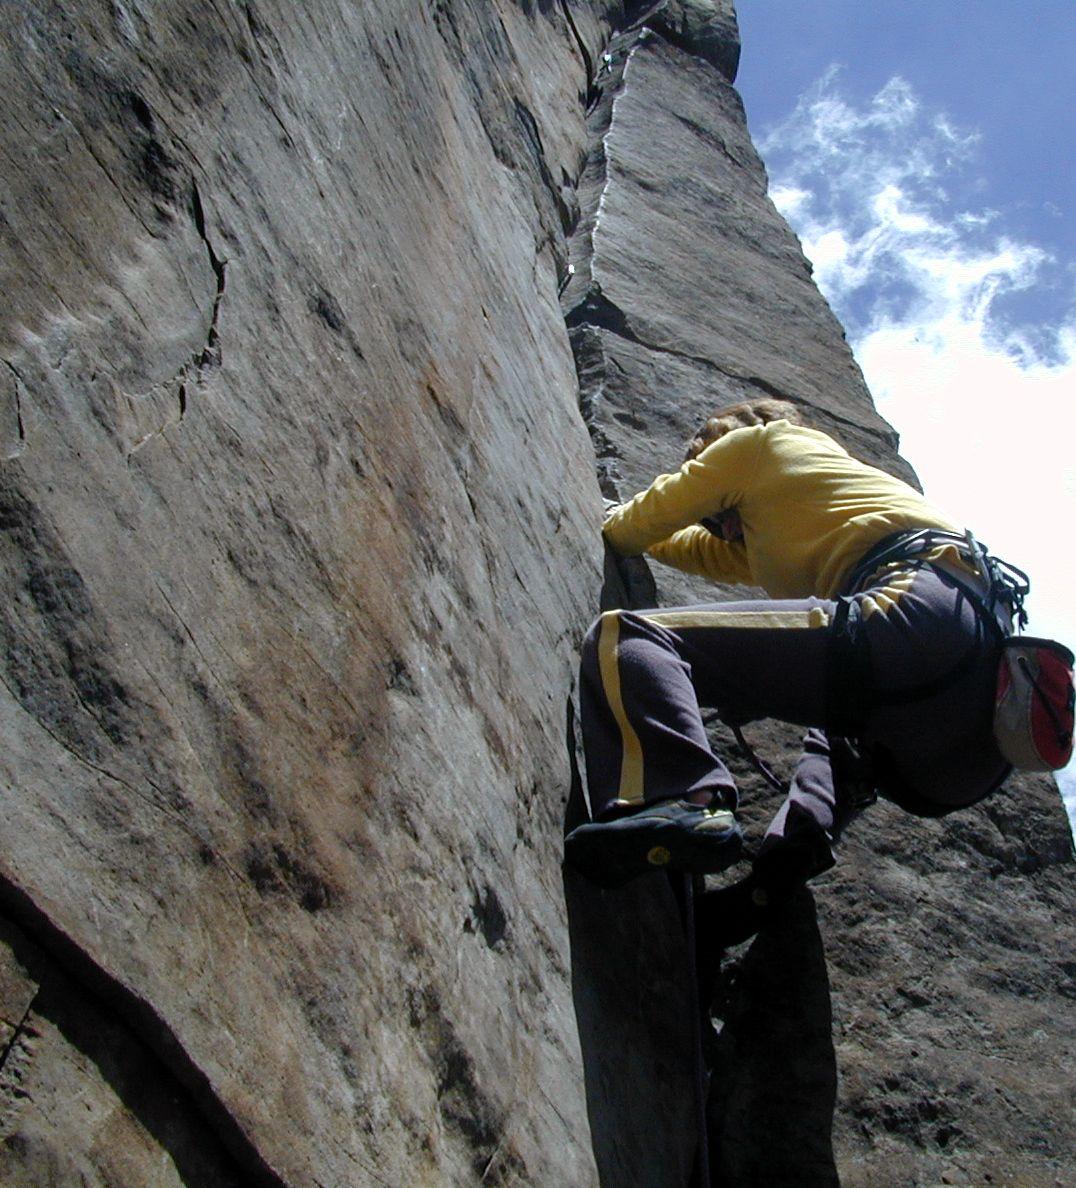 Shelley climbing at Paradise Forks (Flagstaff AZ